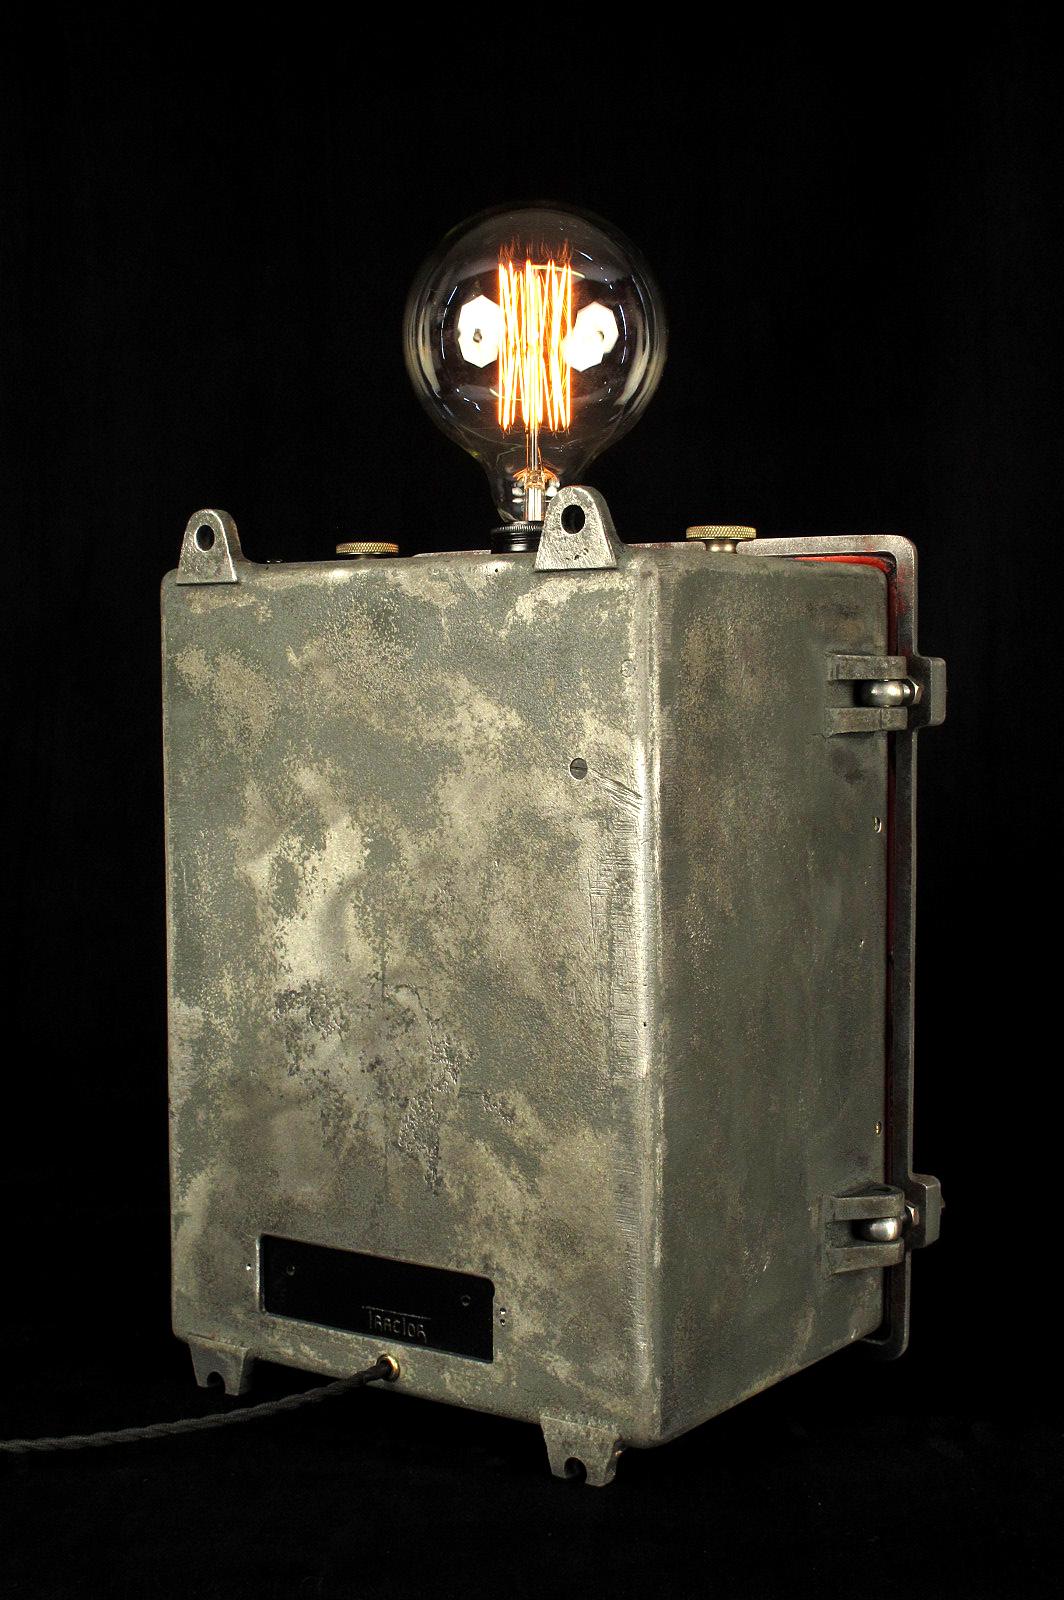 ancien coffret lectrique mis en lumi re lampe unique old school bazaar. Black Bedroom Furniture Sets. Home Design Ideas